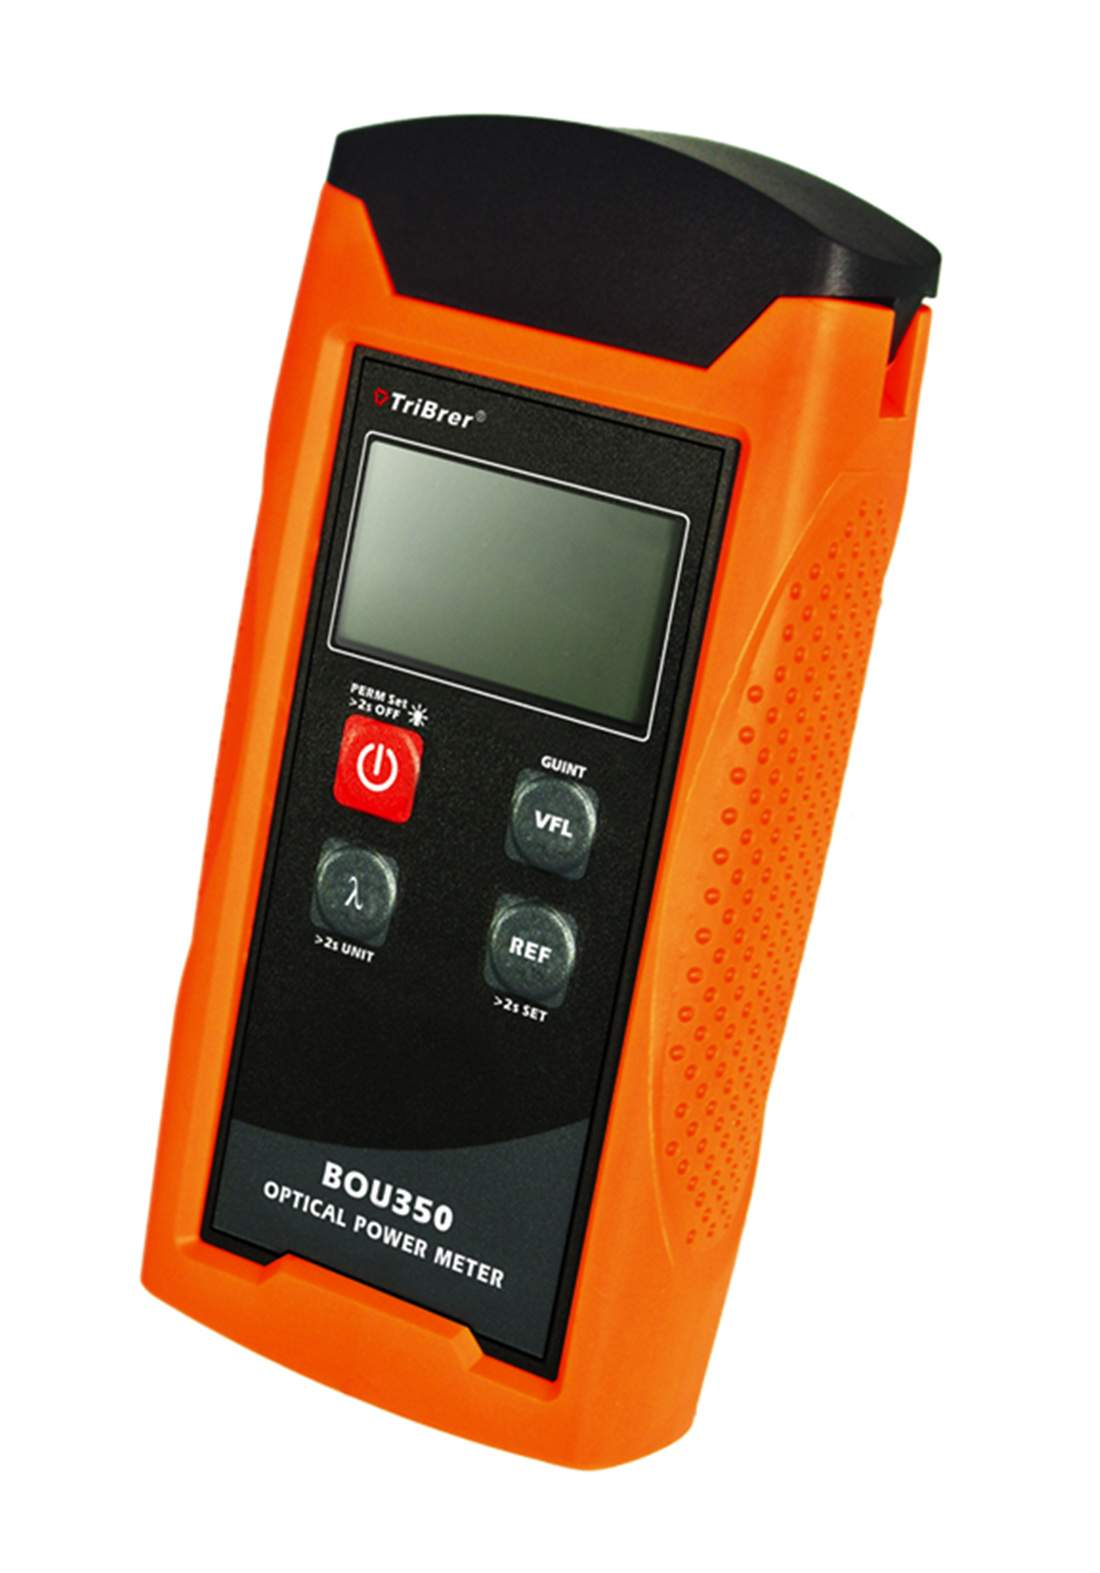 TriBrer BOU350 Optical Power Meter - Orange مقياس طاقة الألياف الضوئية